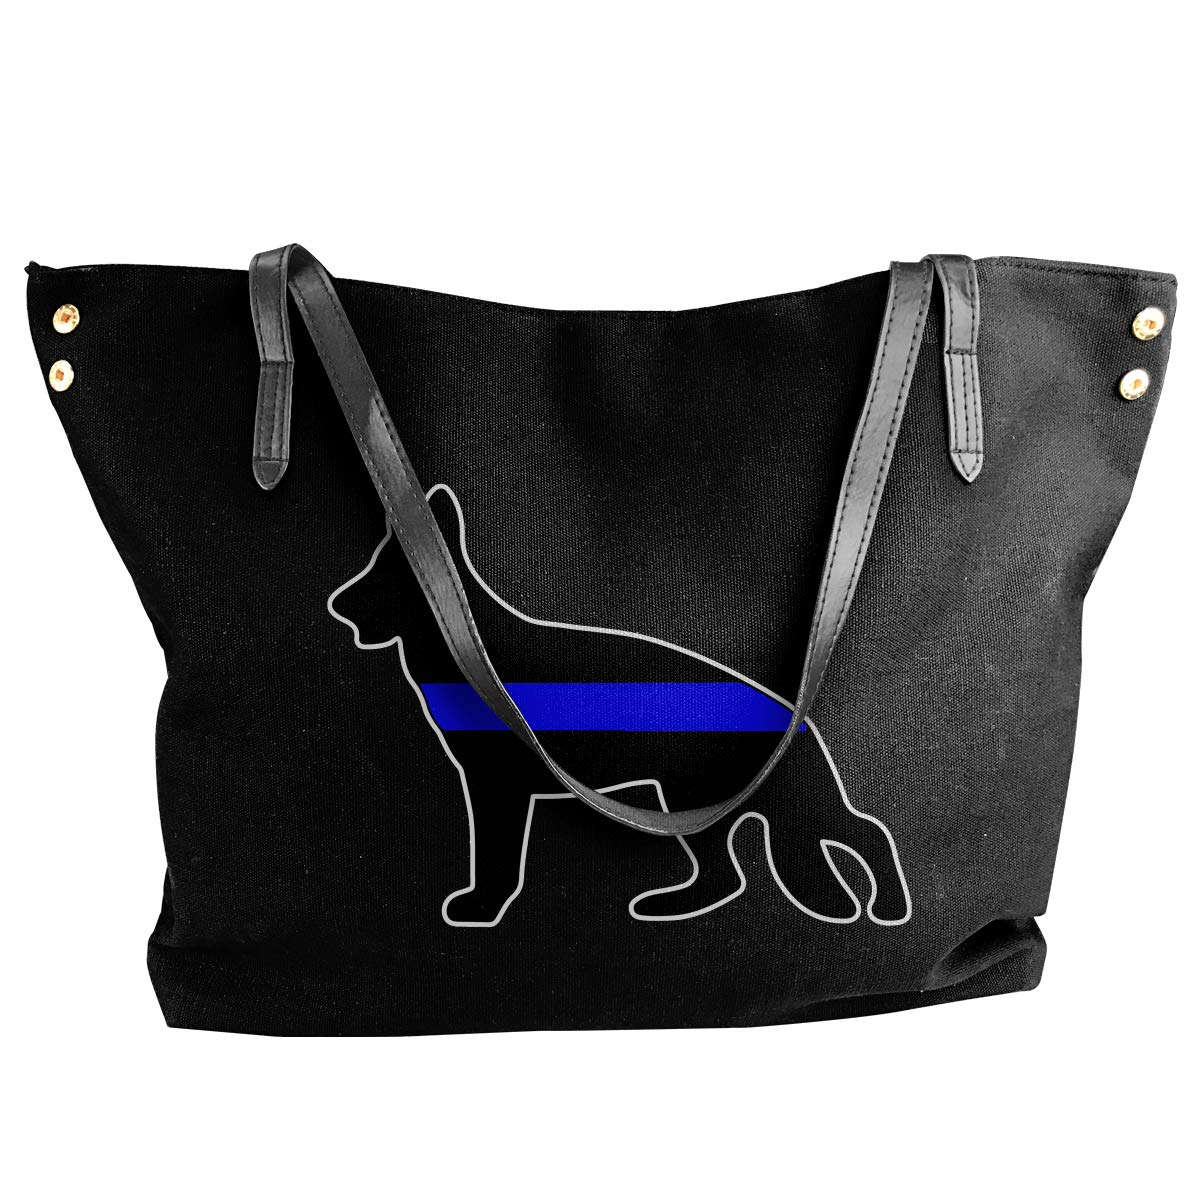 Womens Canvas Large Tote Shoulder Handbag German Shepherd Thin Blue Line Handbags